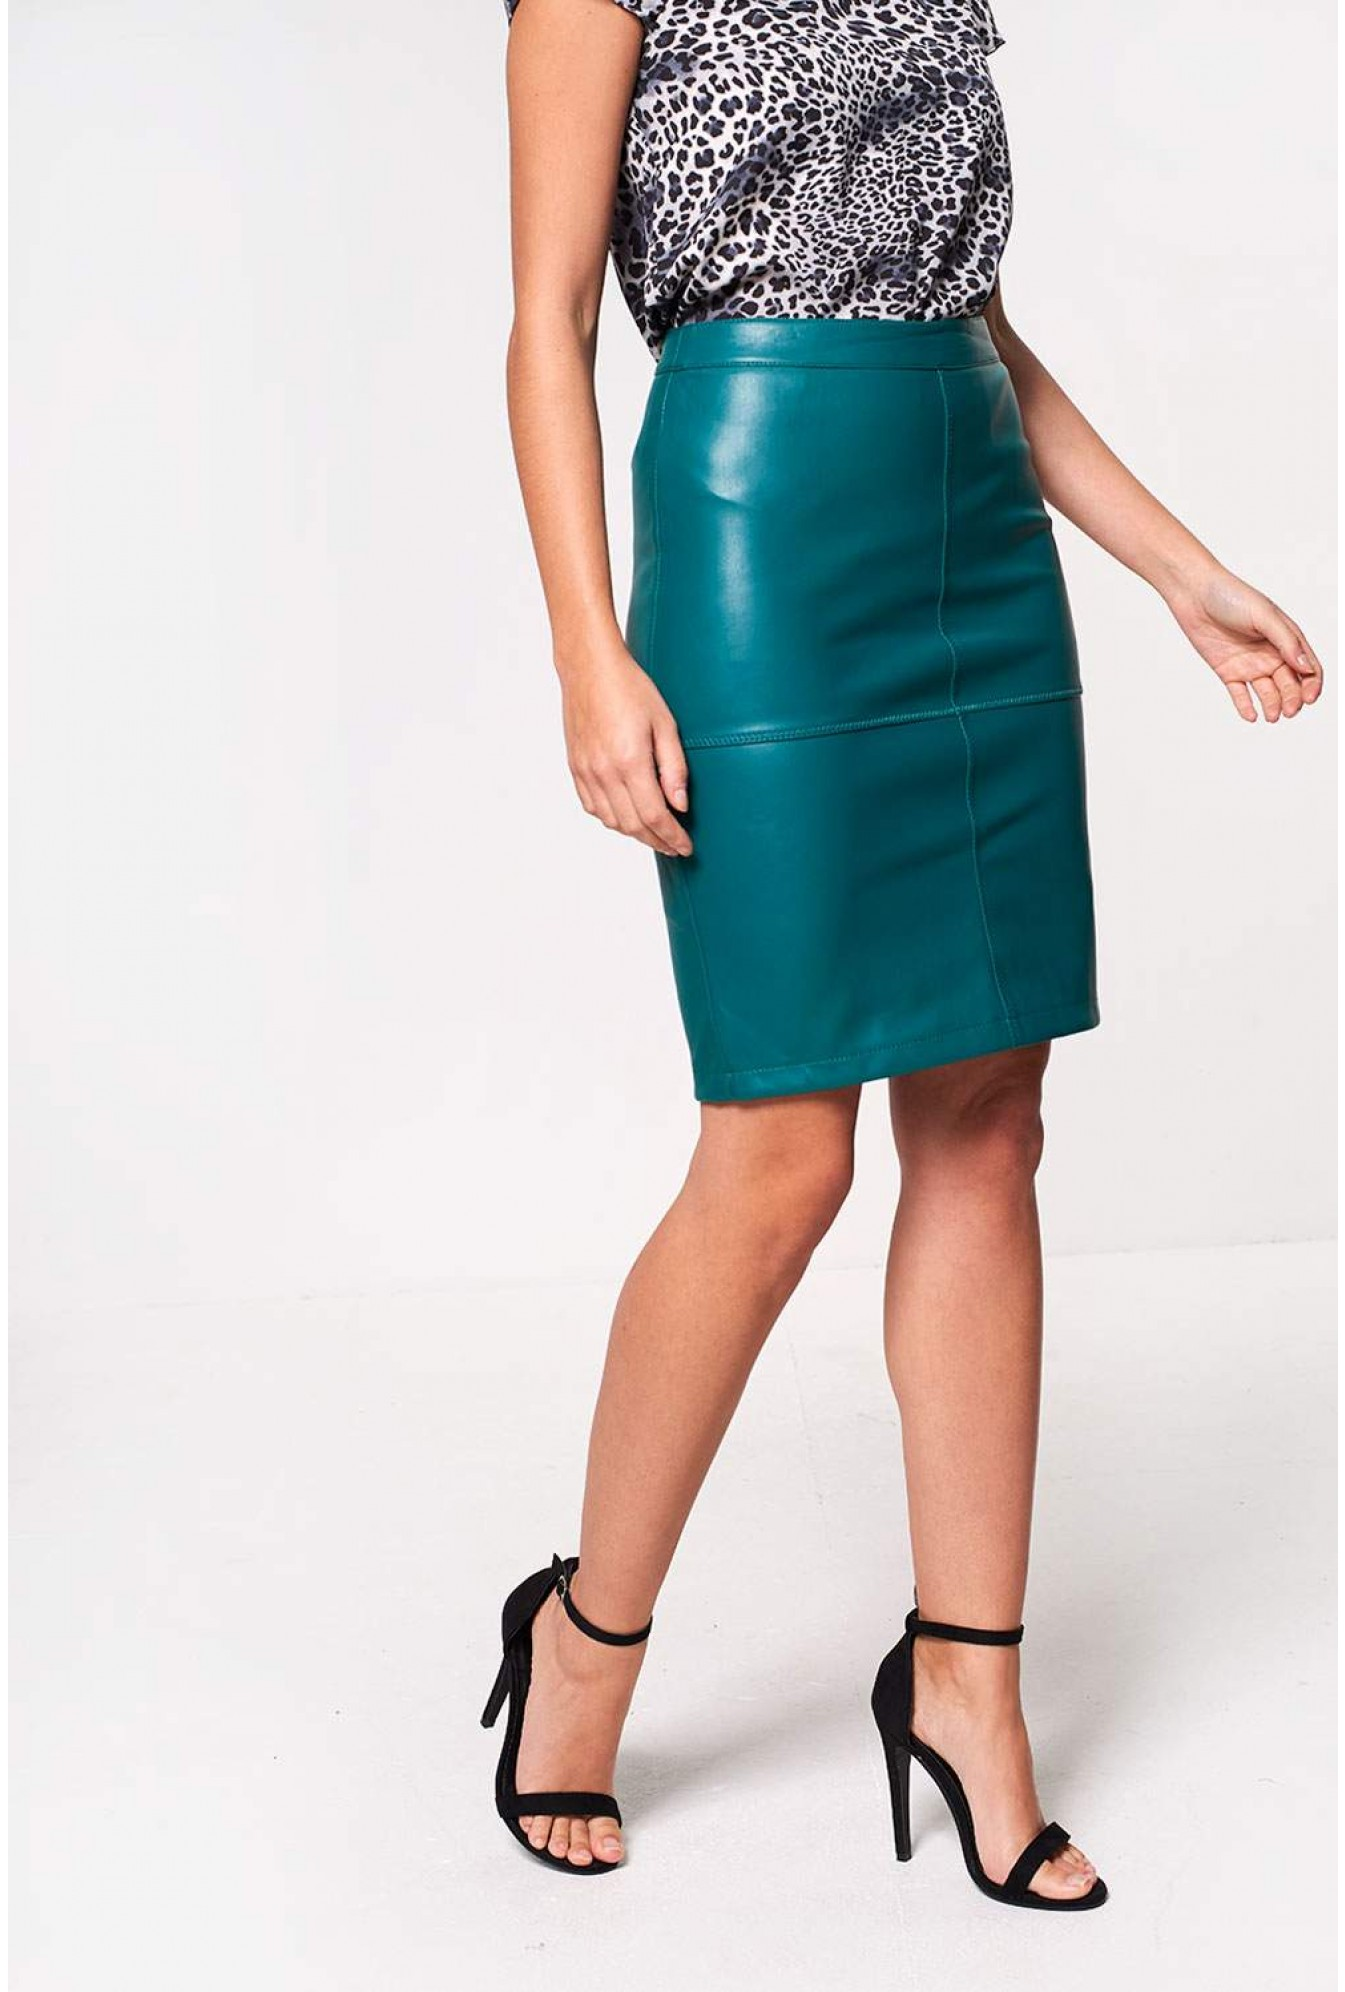 c61b2930c9 Vila Pen PU Pencil Skirt in Green | iCLOTHING